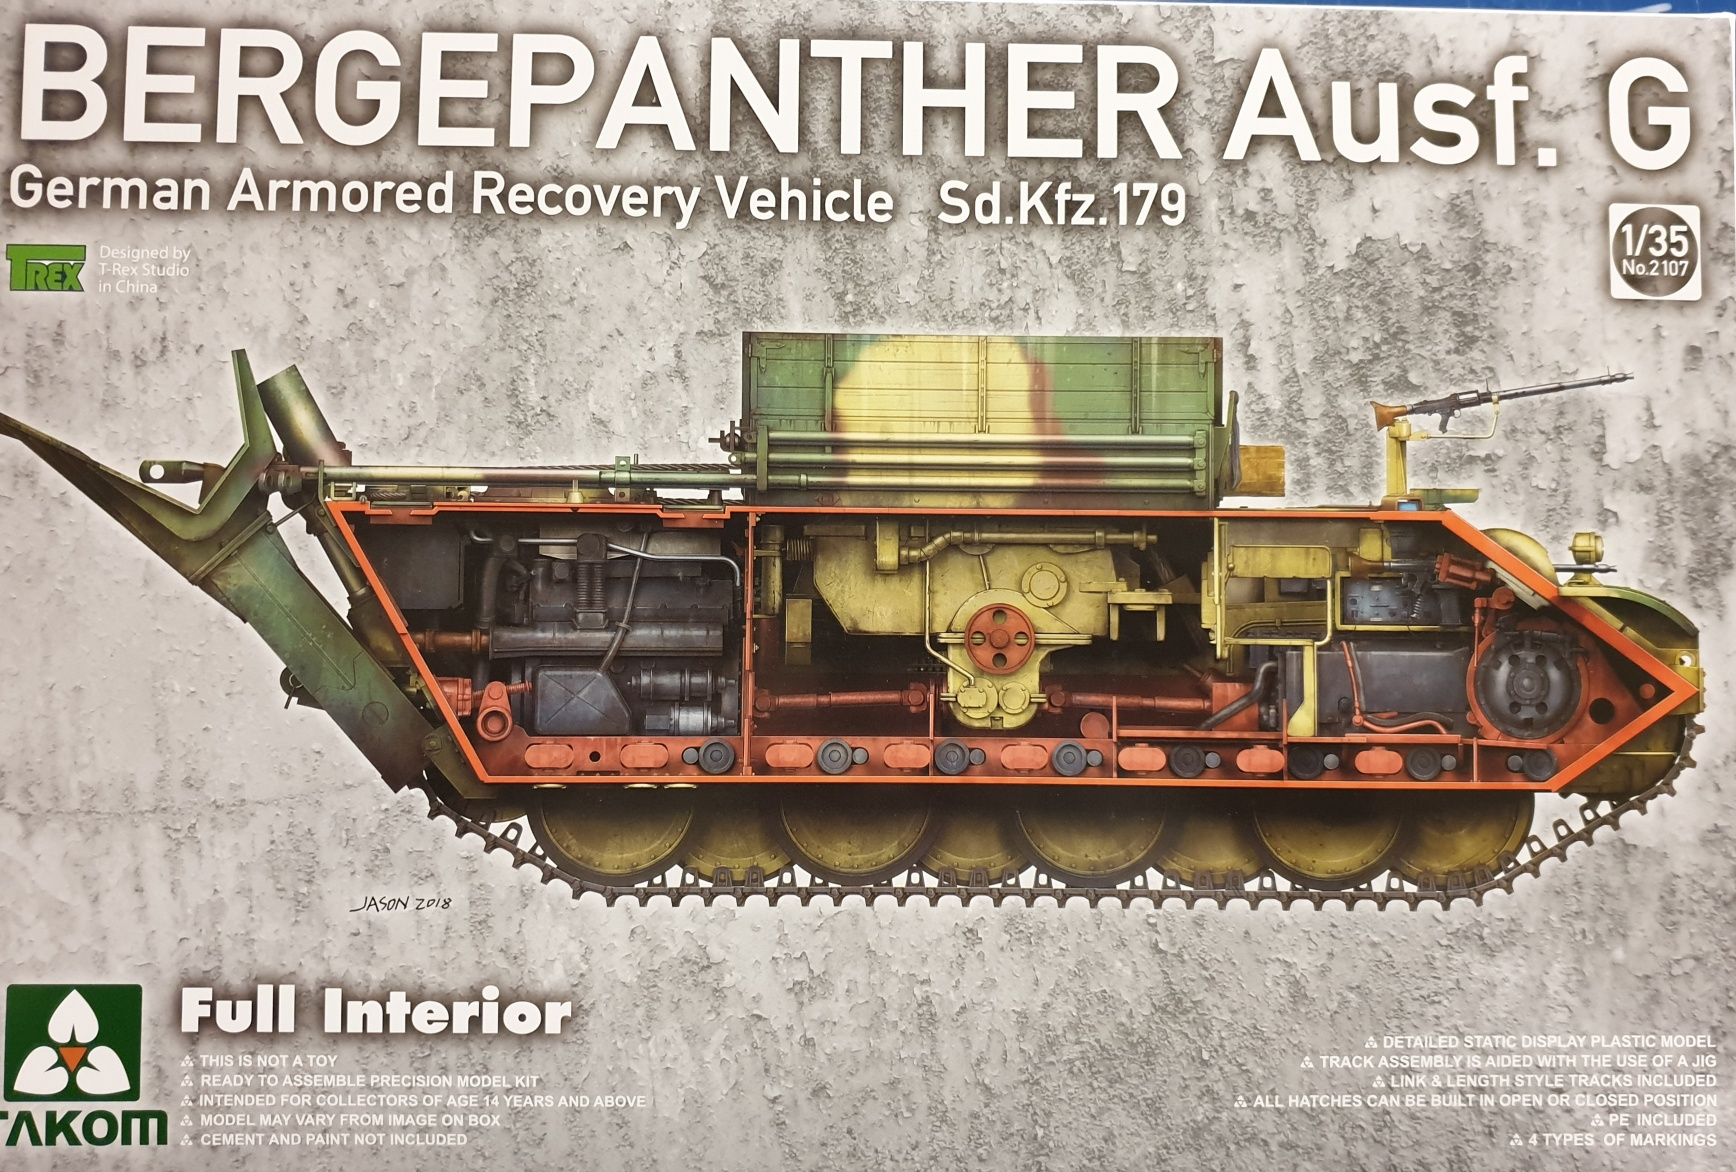 Takom 2107 Bergepanther Ausf. G Sd.Kfz. 179